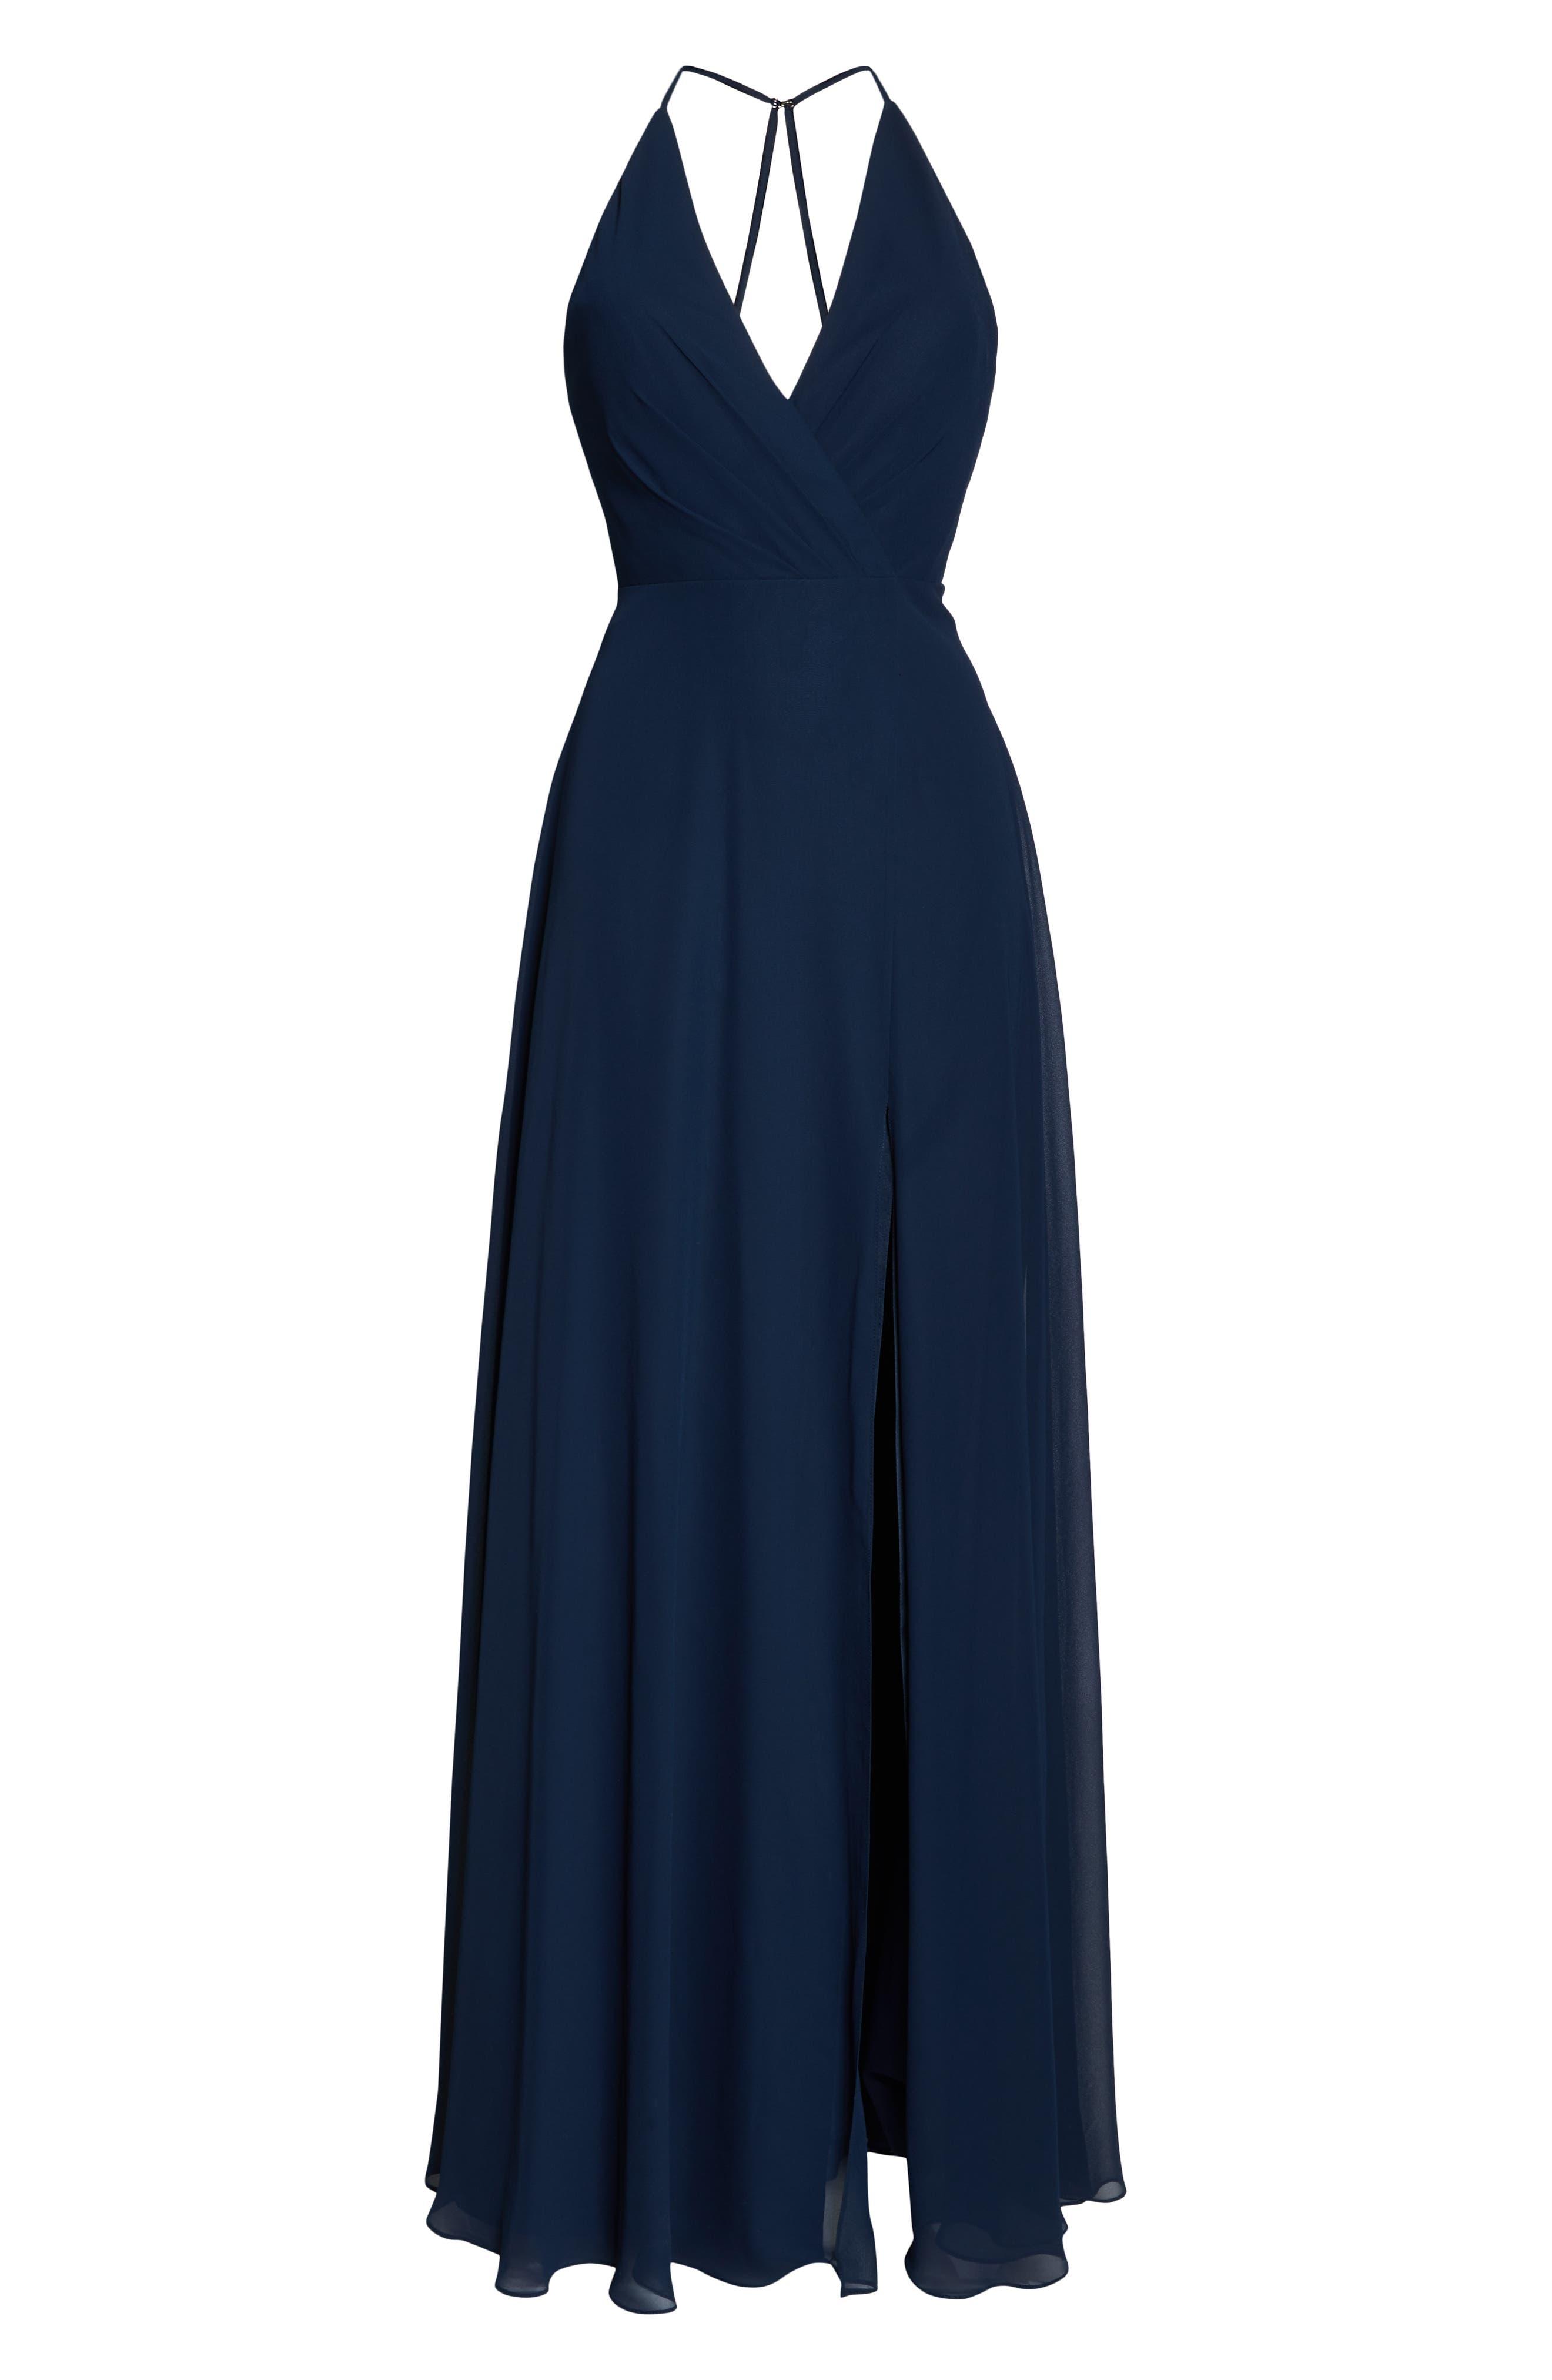 JENNY YOO, Bryce Surplice V-Neck Chiffon Evening Dress, Alternate thumbnail 7, color, NAVY